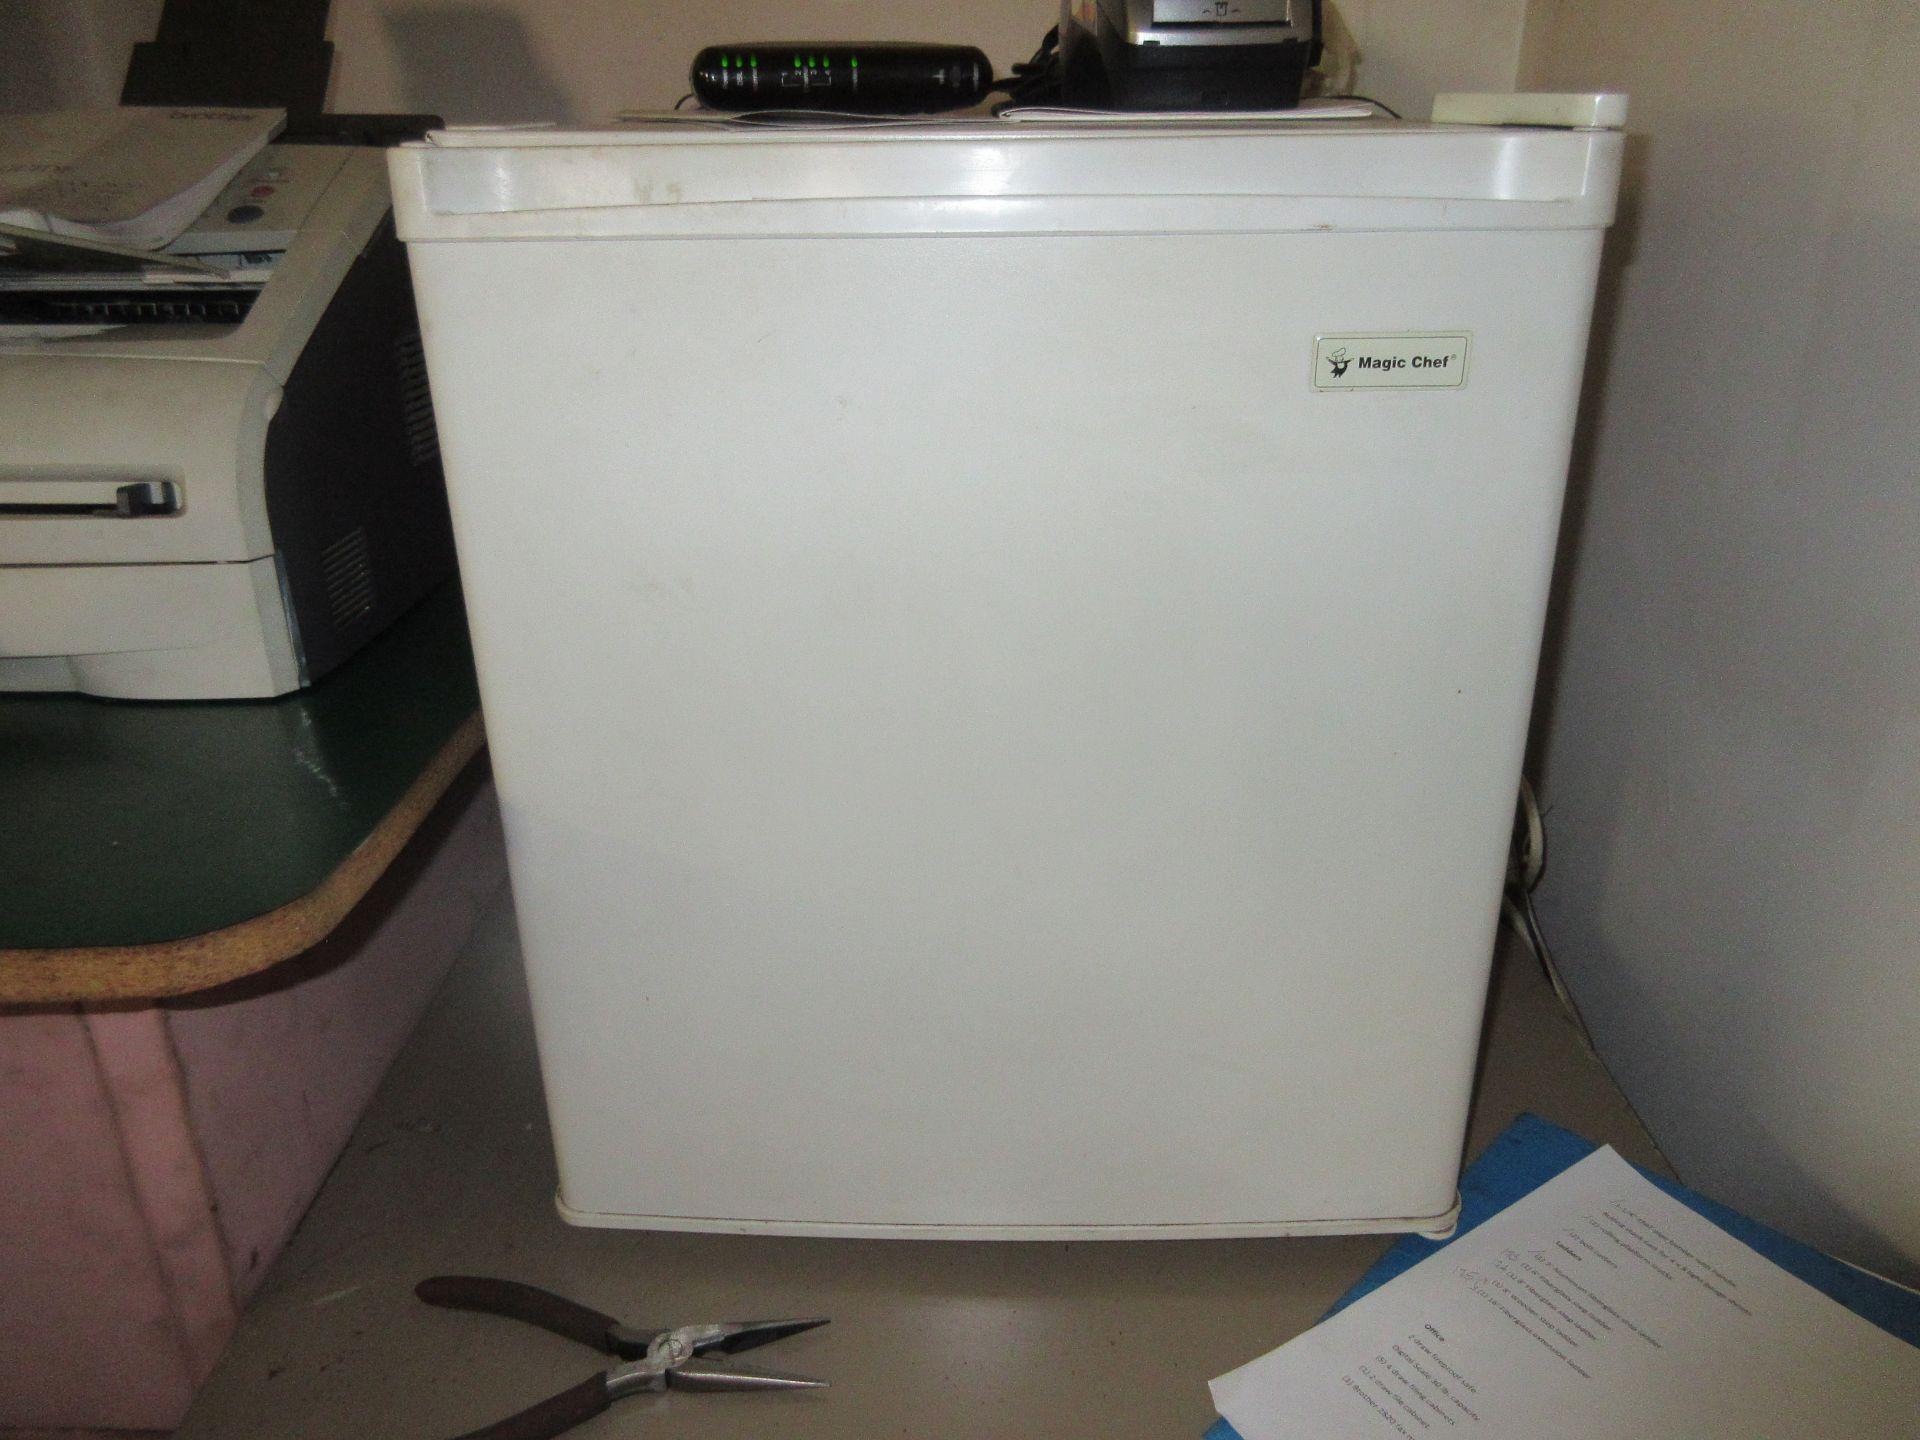 LOT Microwave, Fax Machine, Desk, Fridge in Office (No Computers)